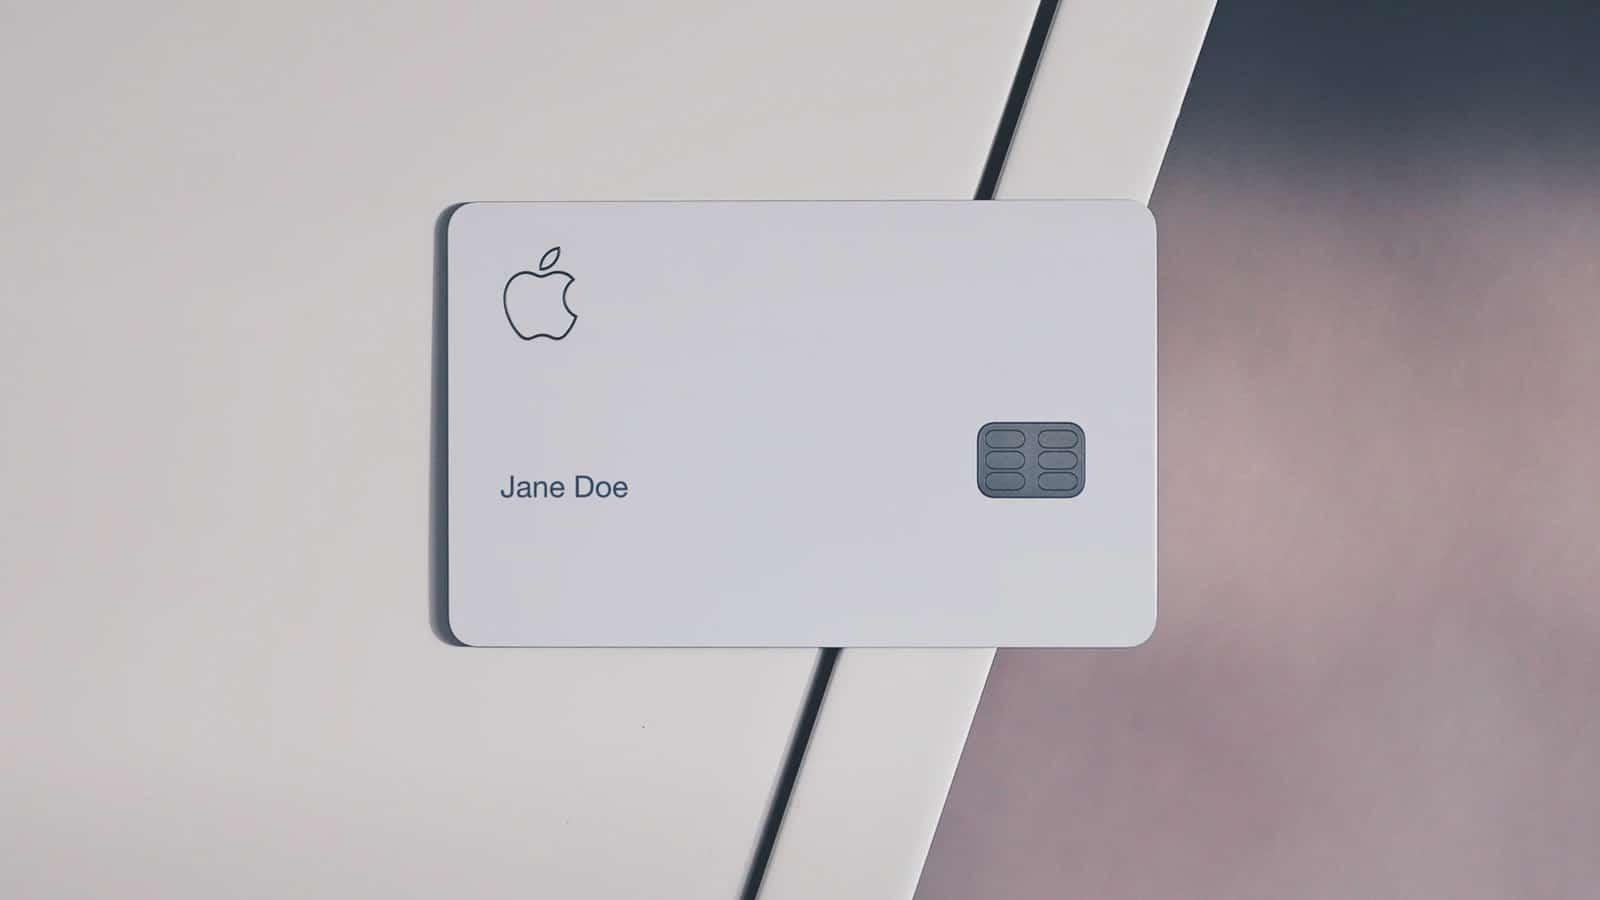 apple card on table